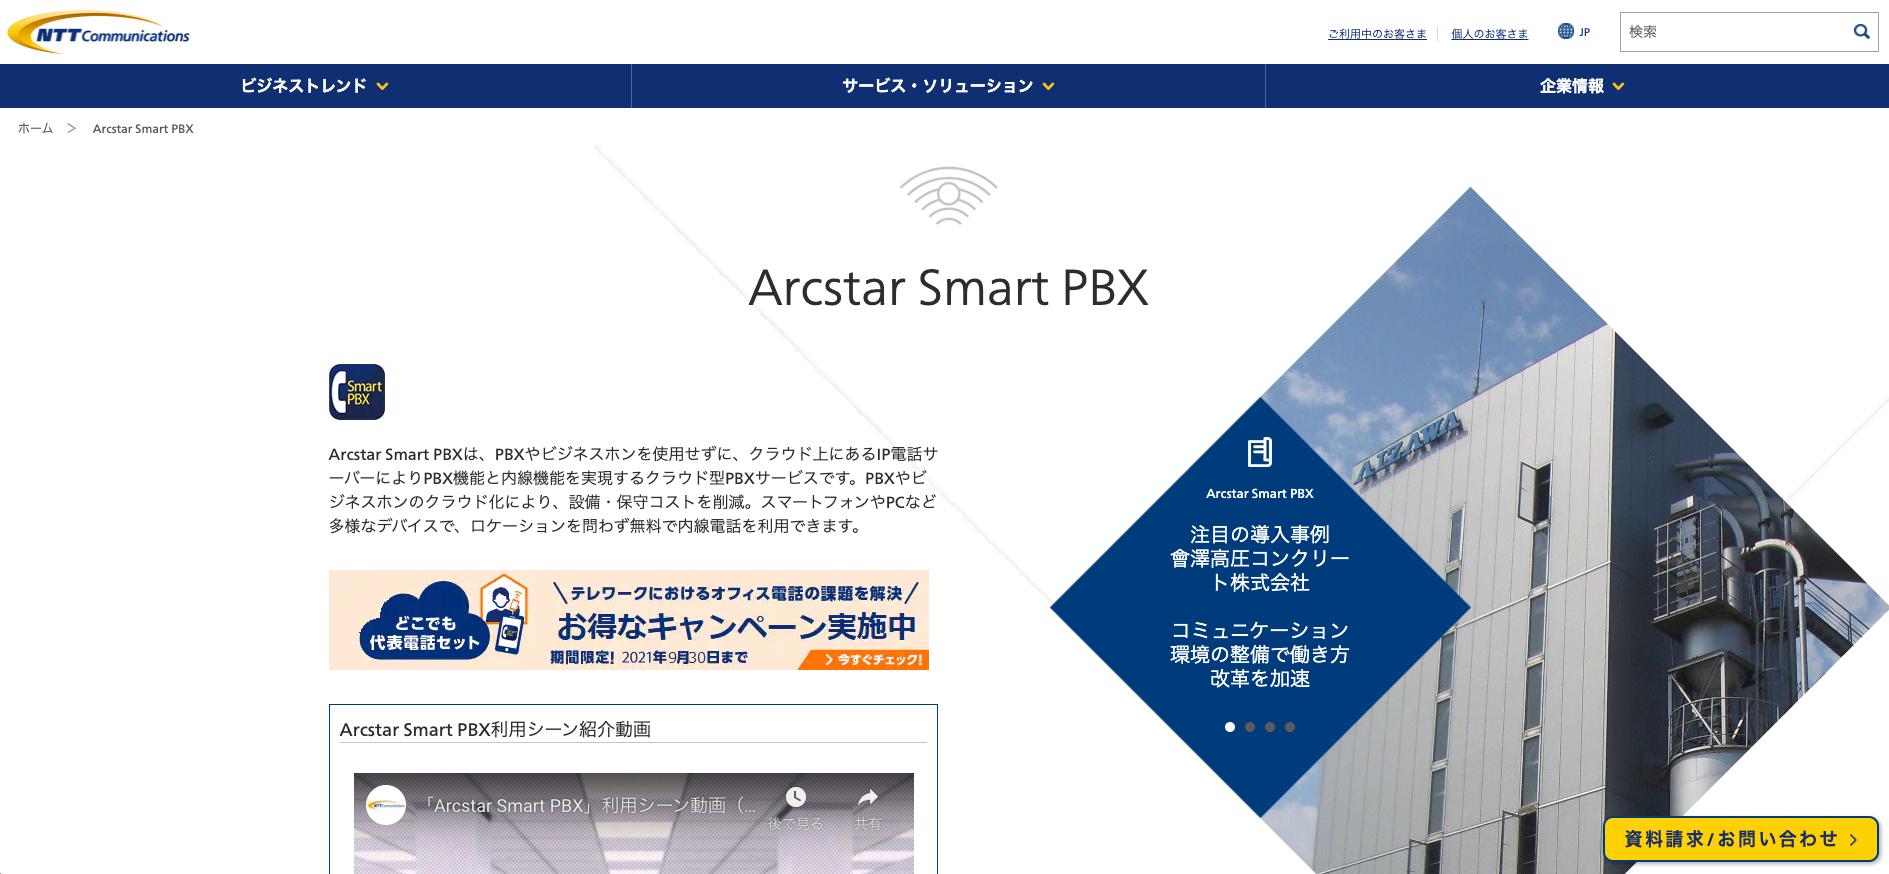 Arcstar Smart PBXキャプチャ